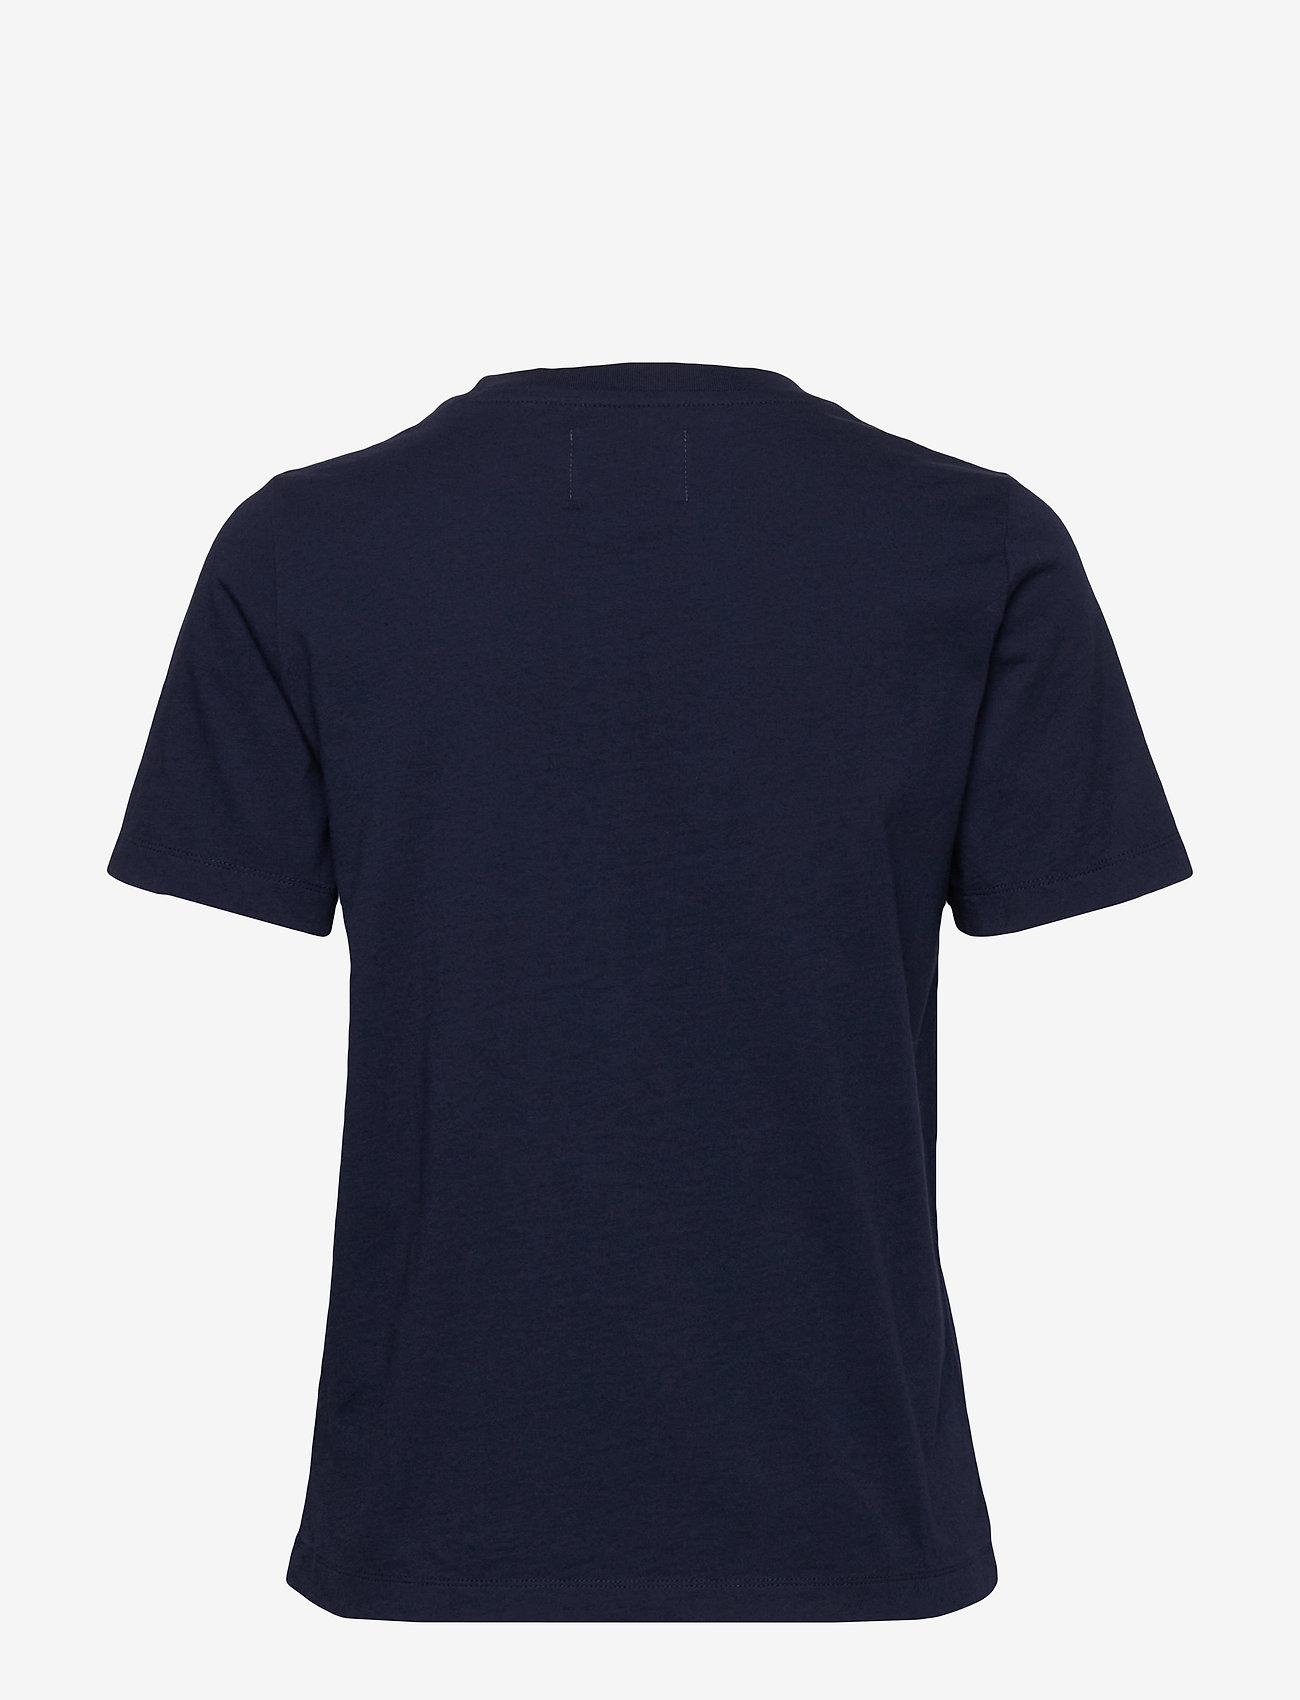 Mia T-shirt (Navy) - Wood Wood Zk3dw4